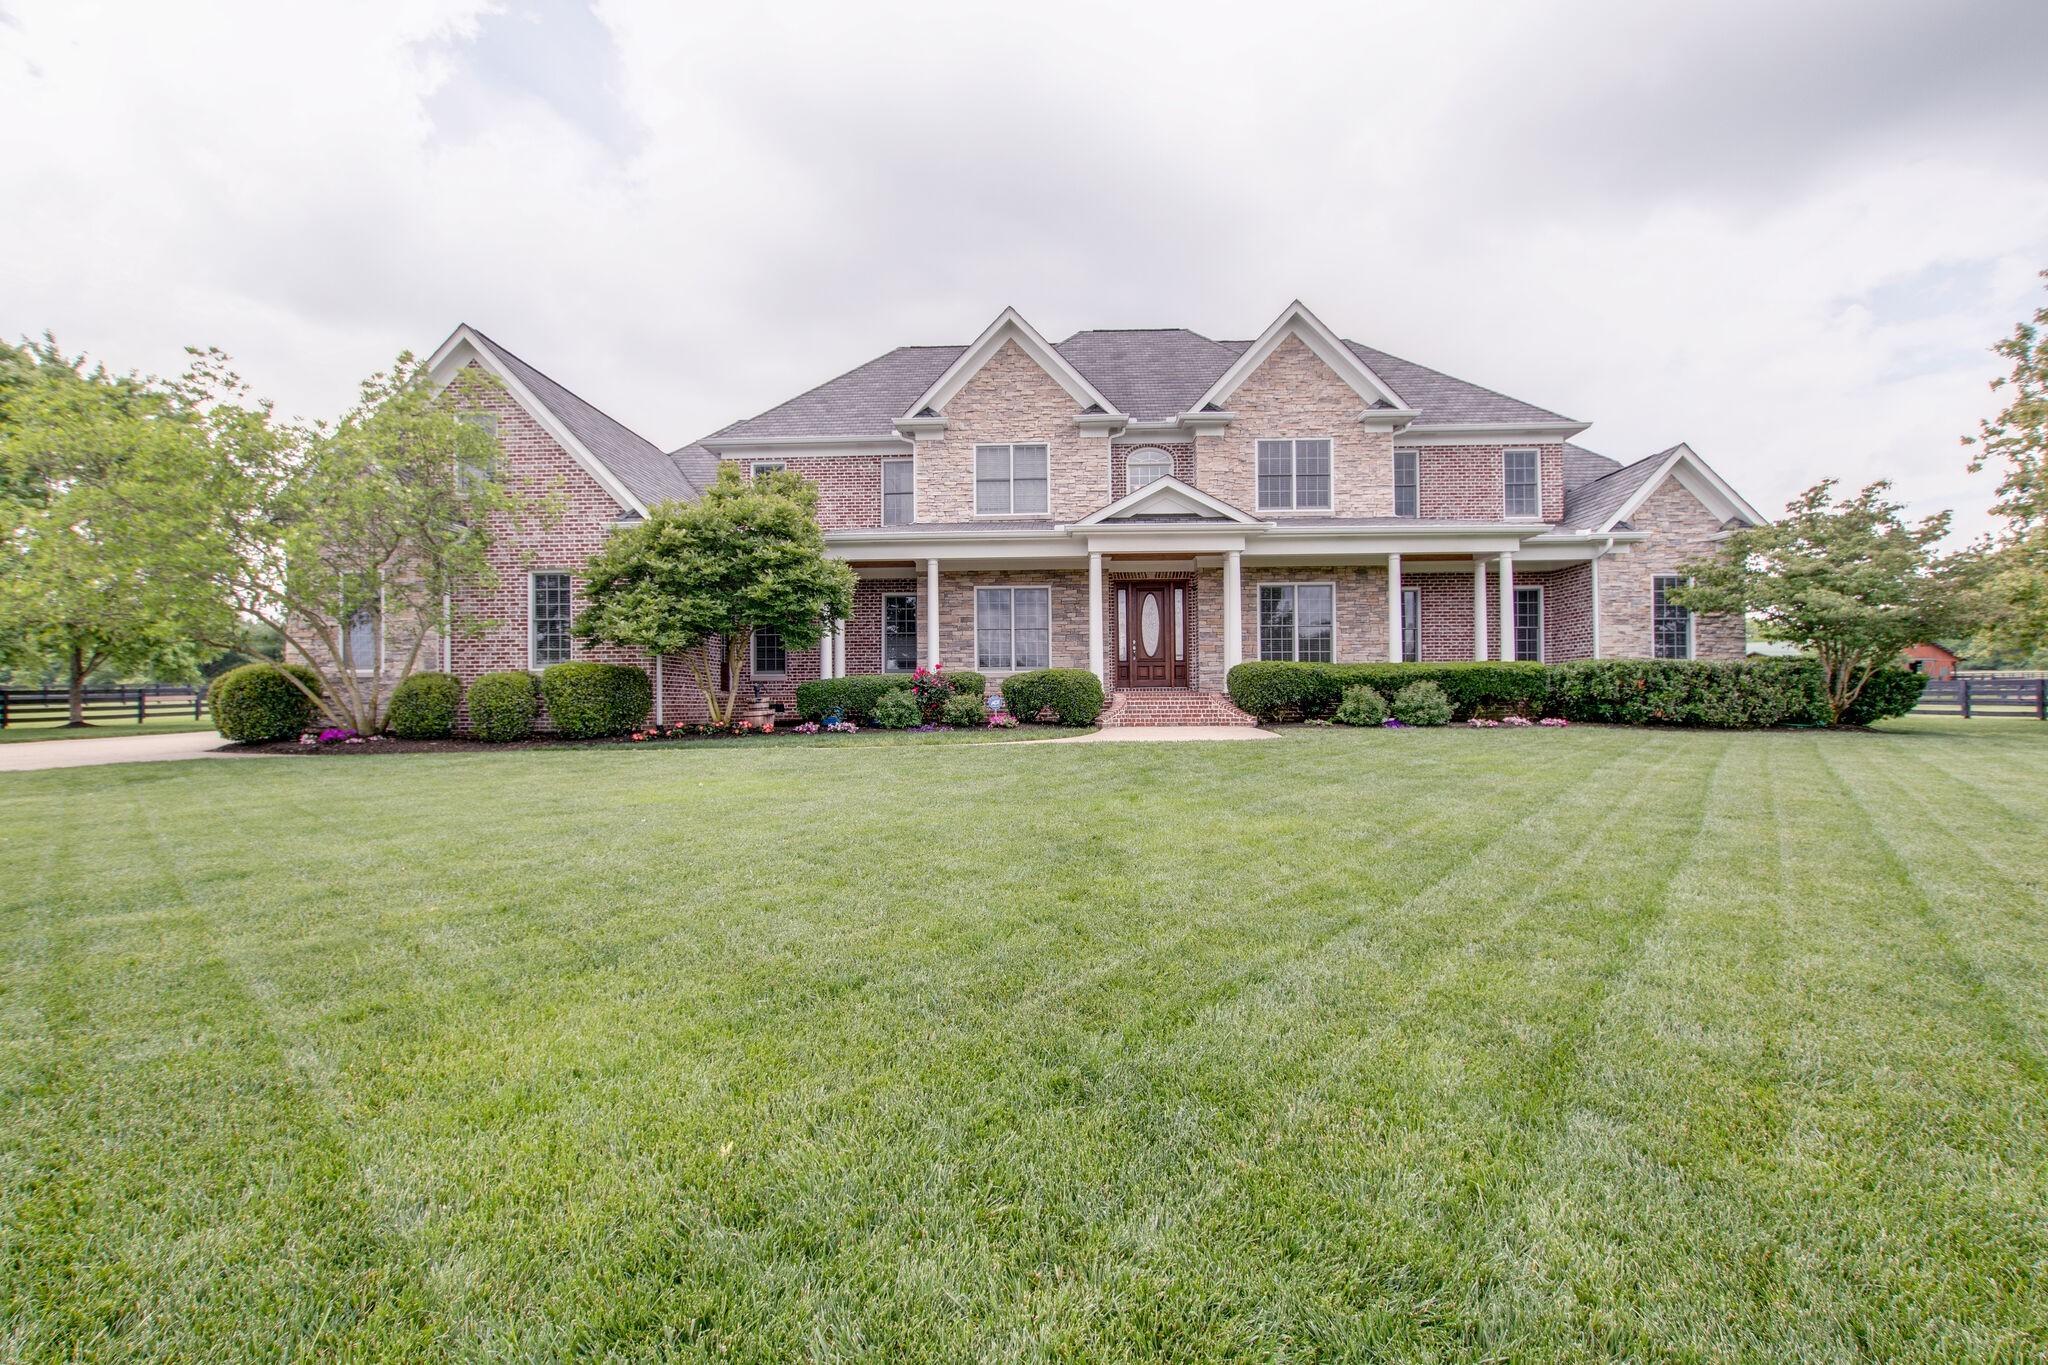 2305 Firefly Ct, Franklin, TN 37069 - Franklin, TN real estate listing